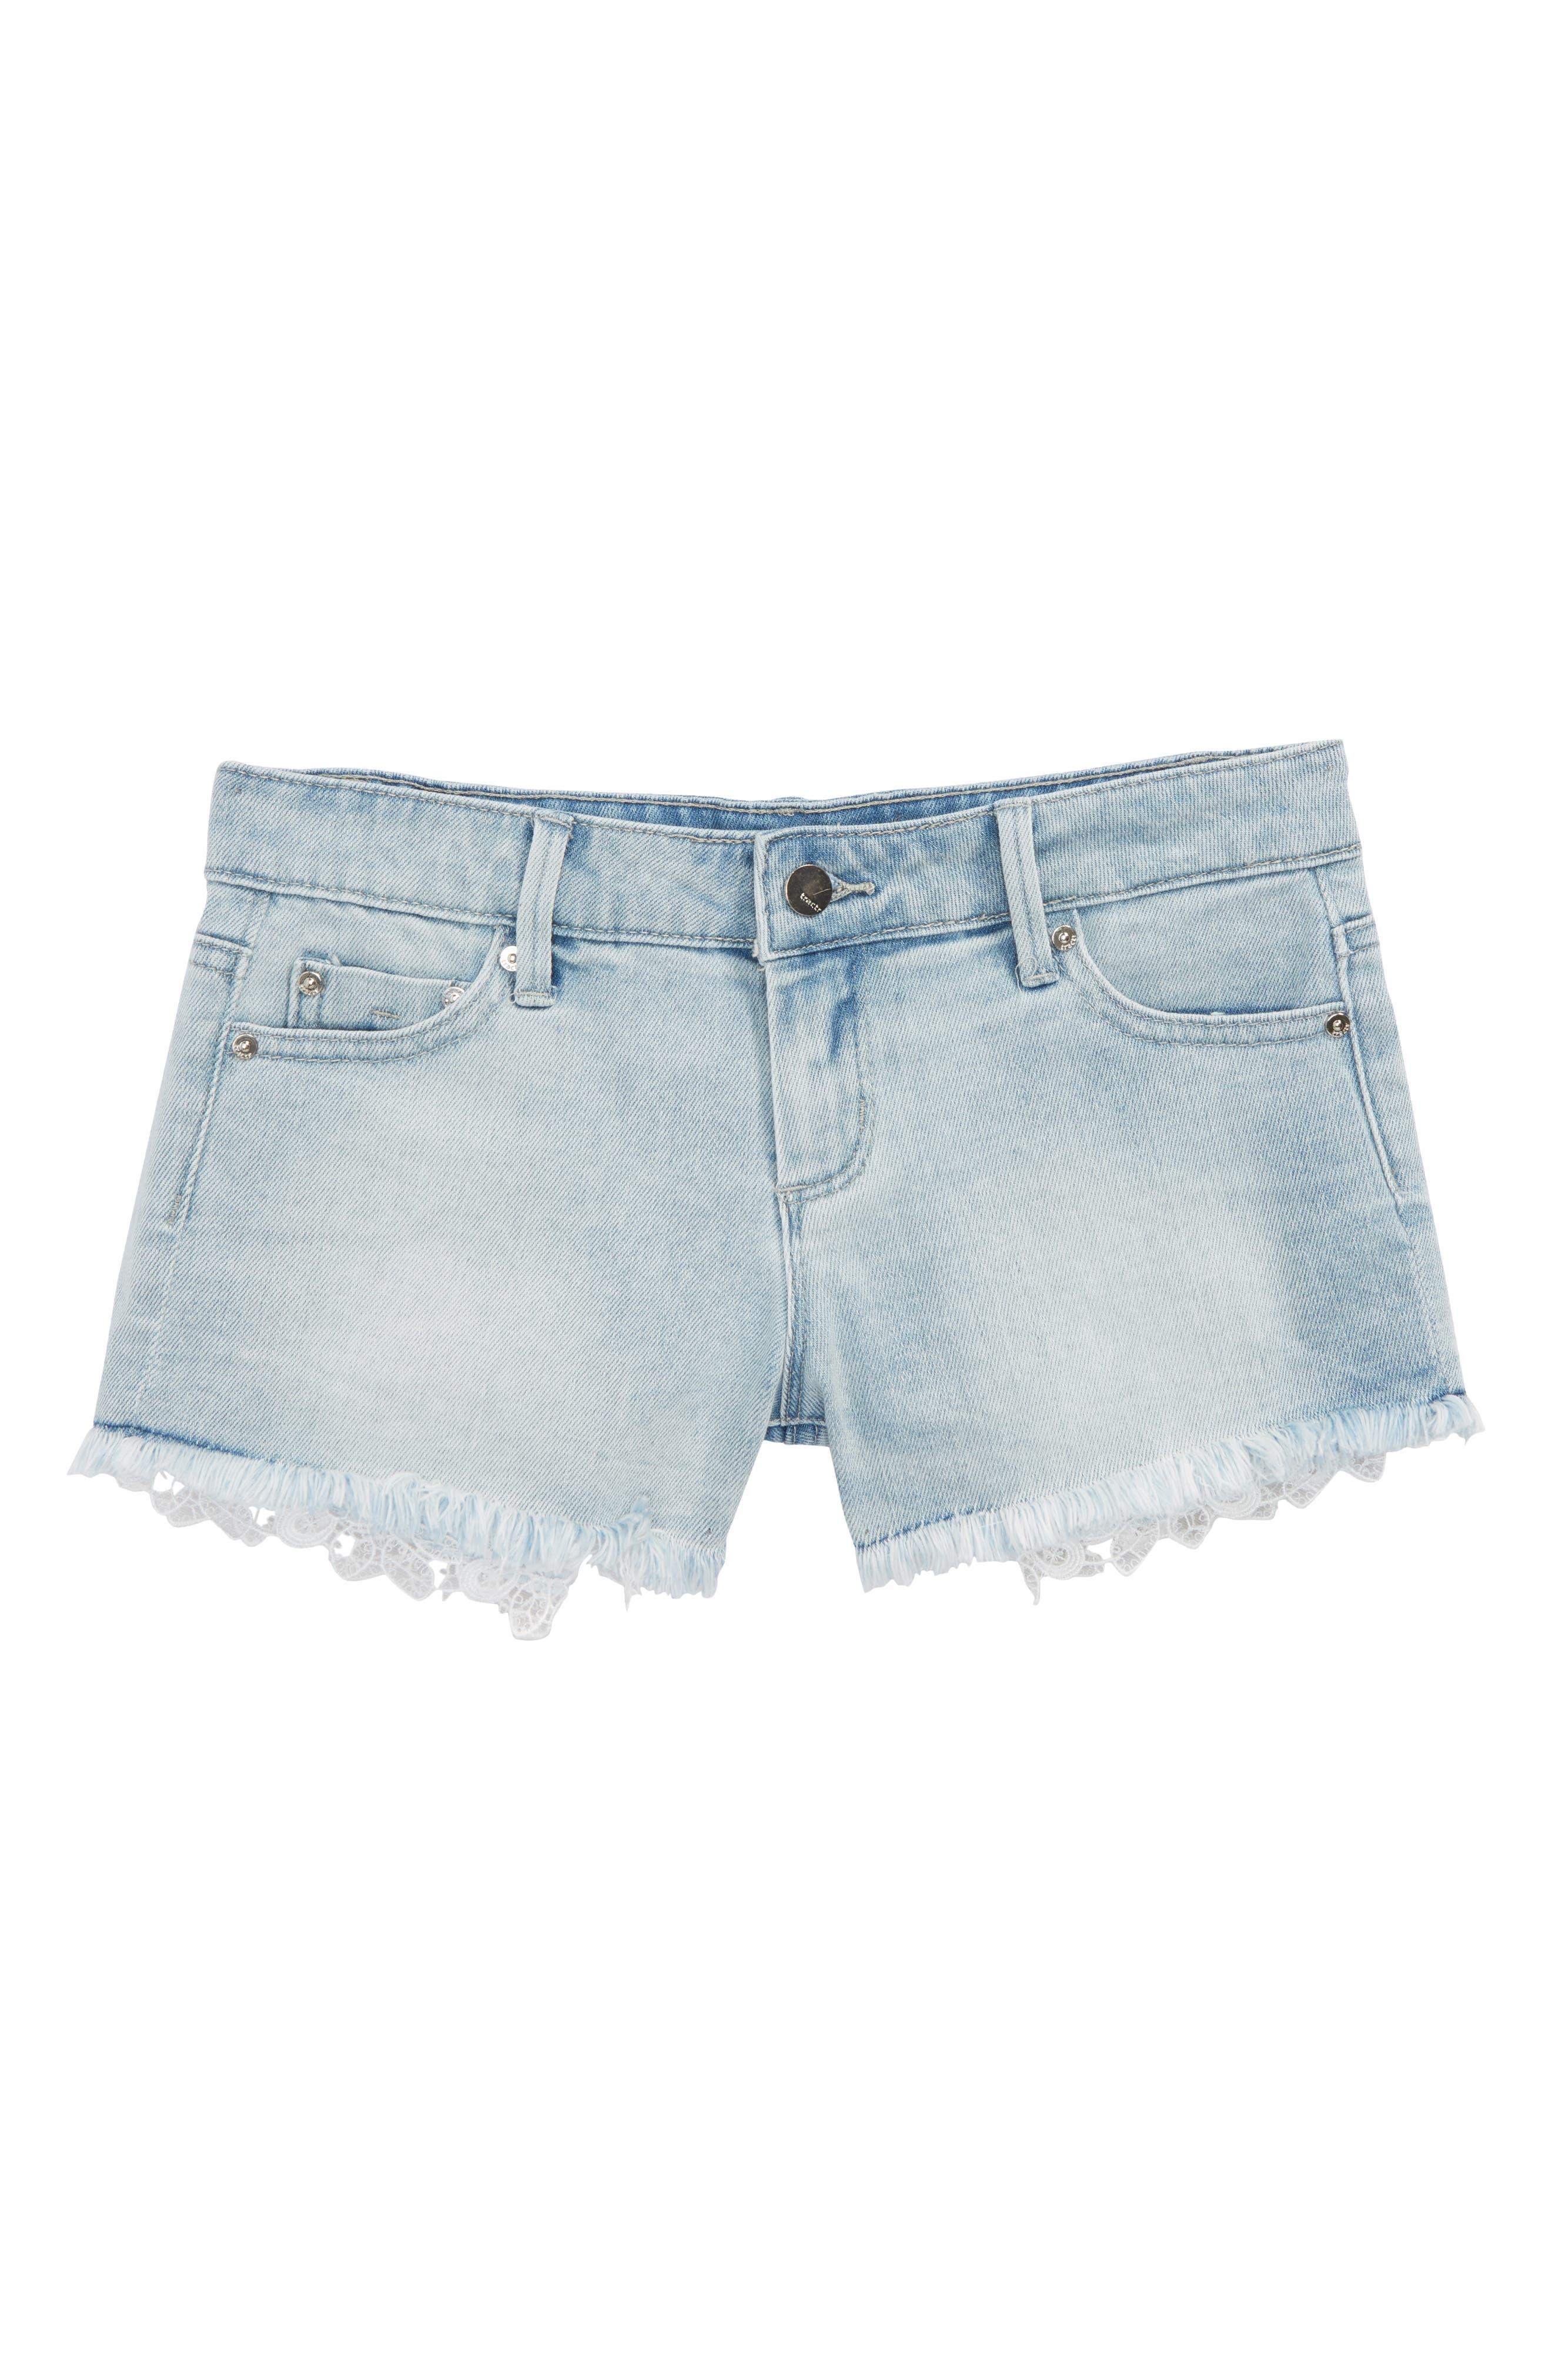 Lace Denim Shorts,                         Main,                         color, Light Indigo